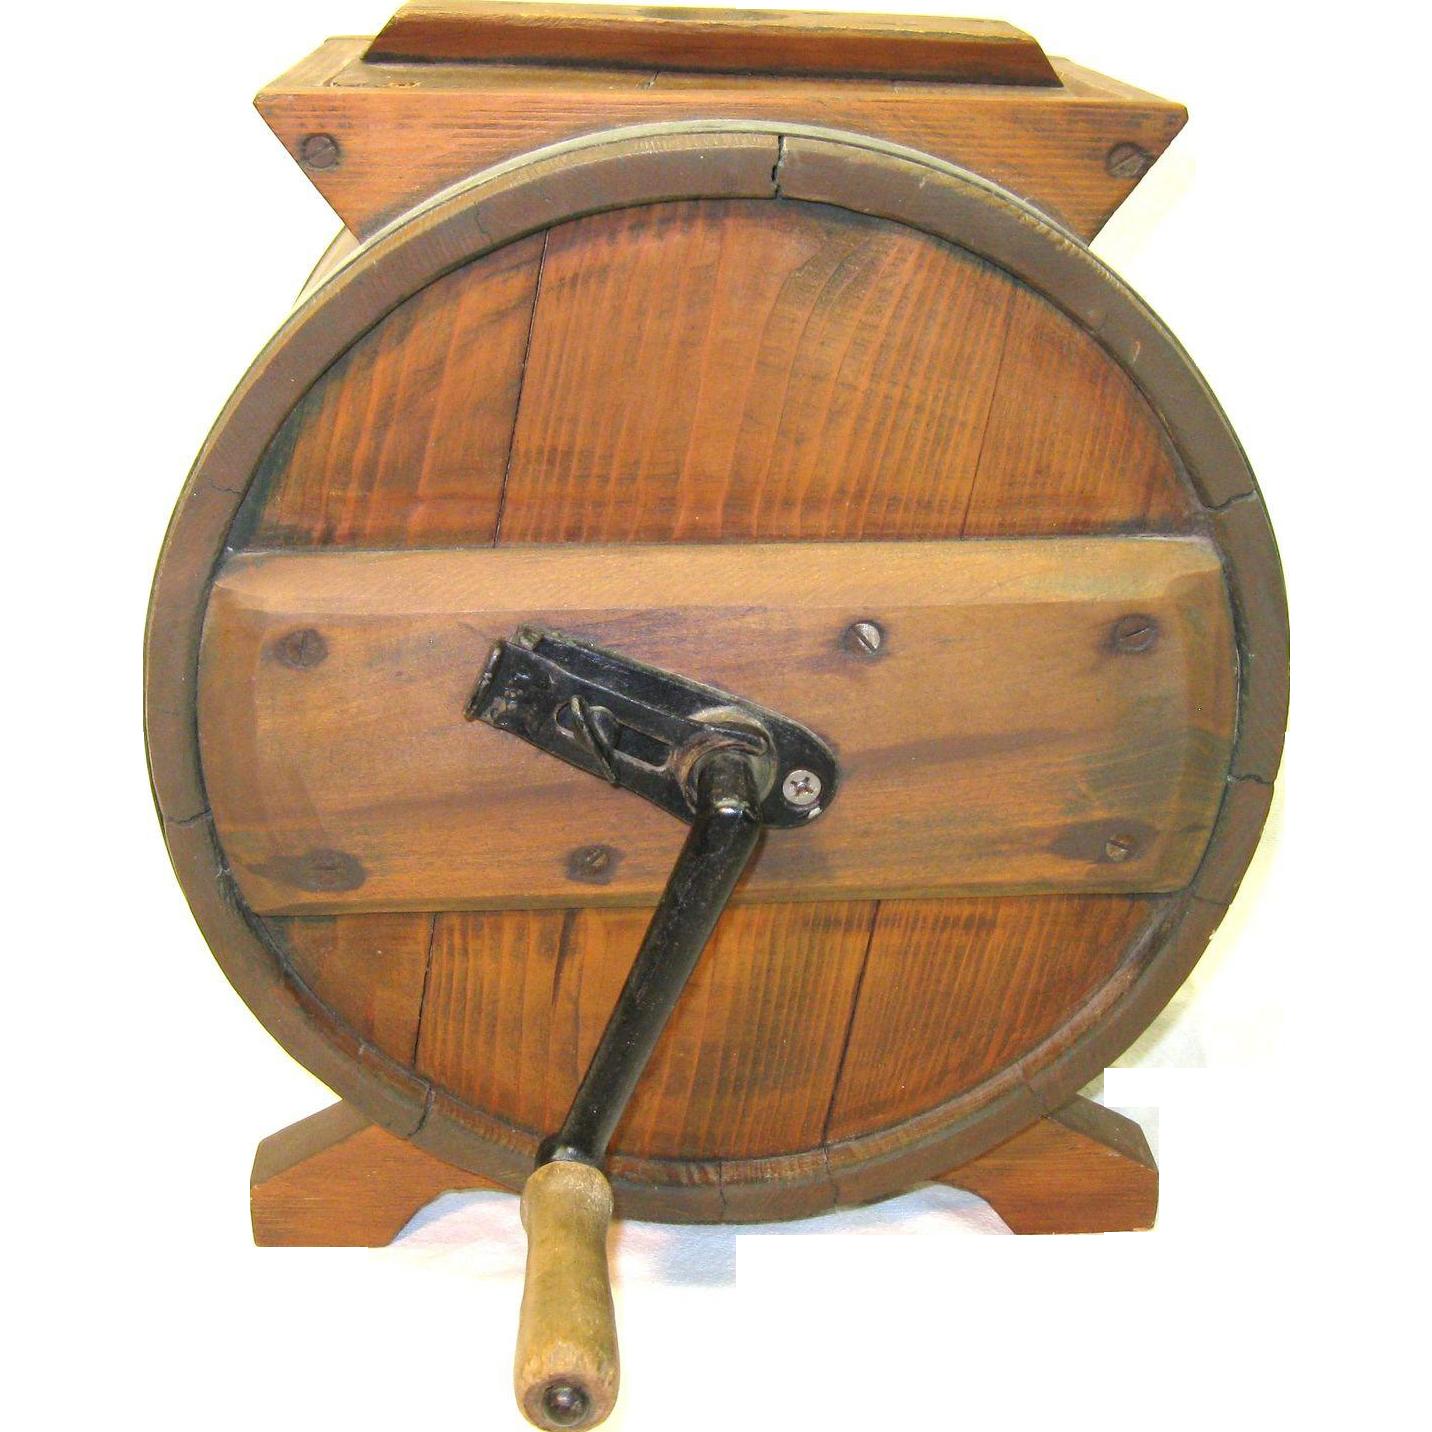 Antique 19th. Century hand crank butter churn.